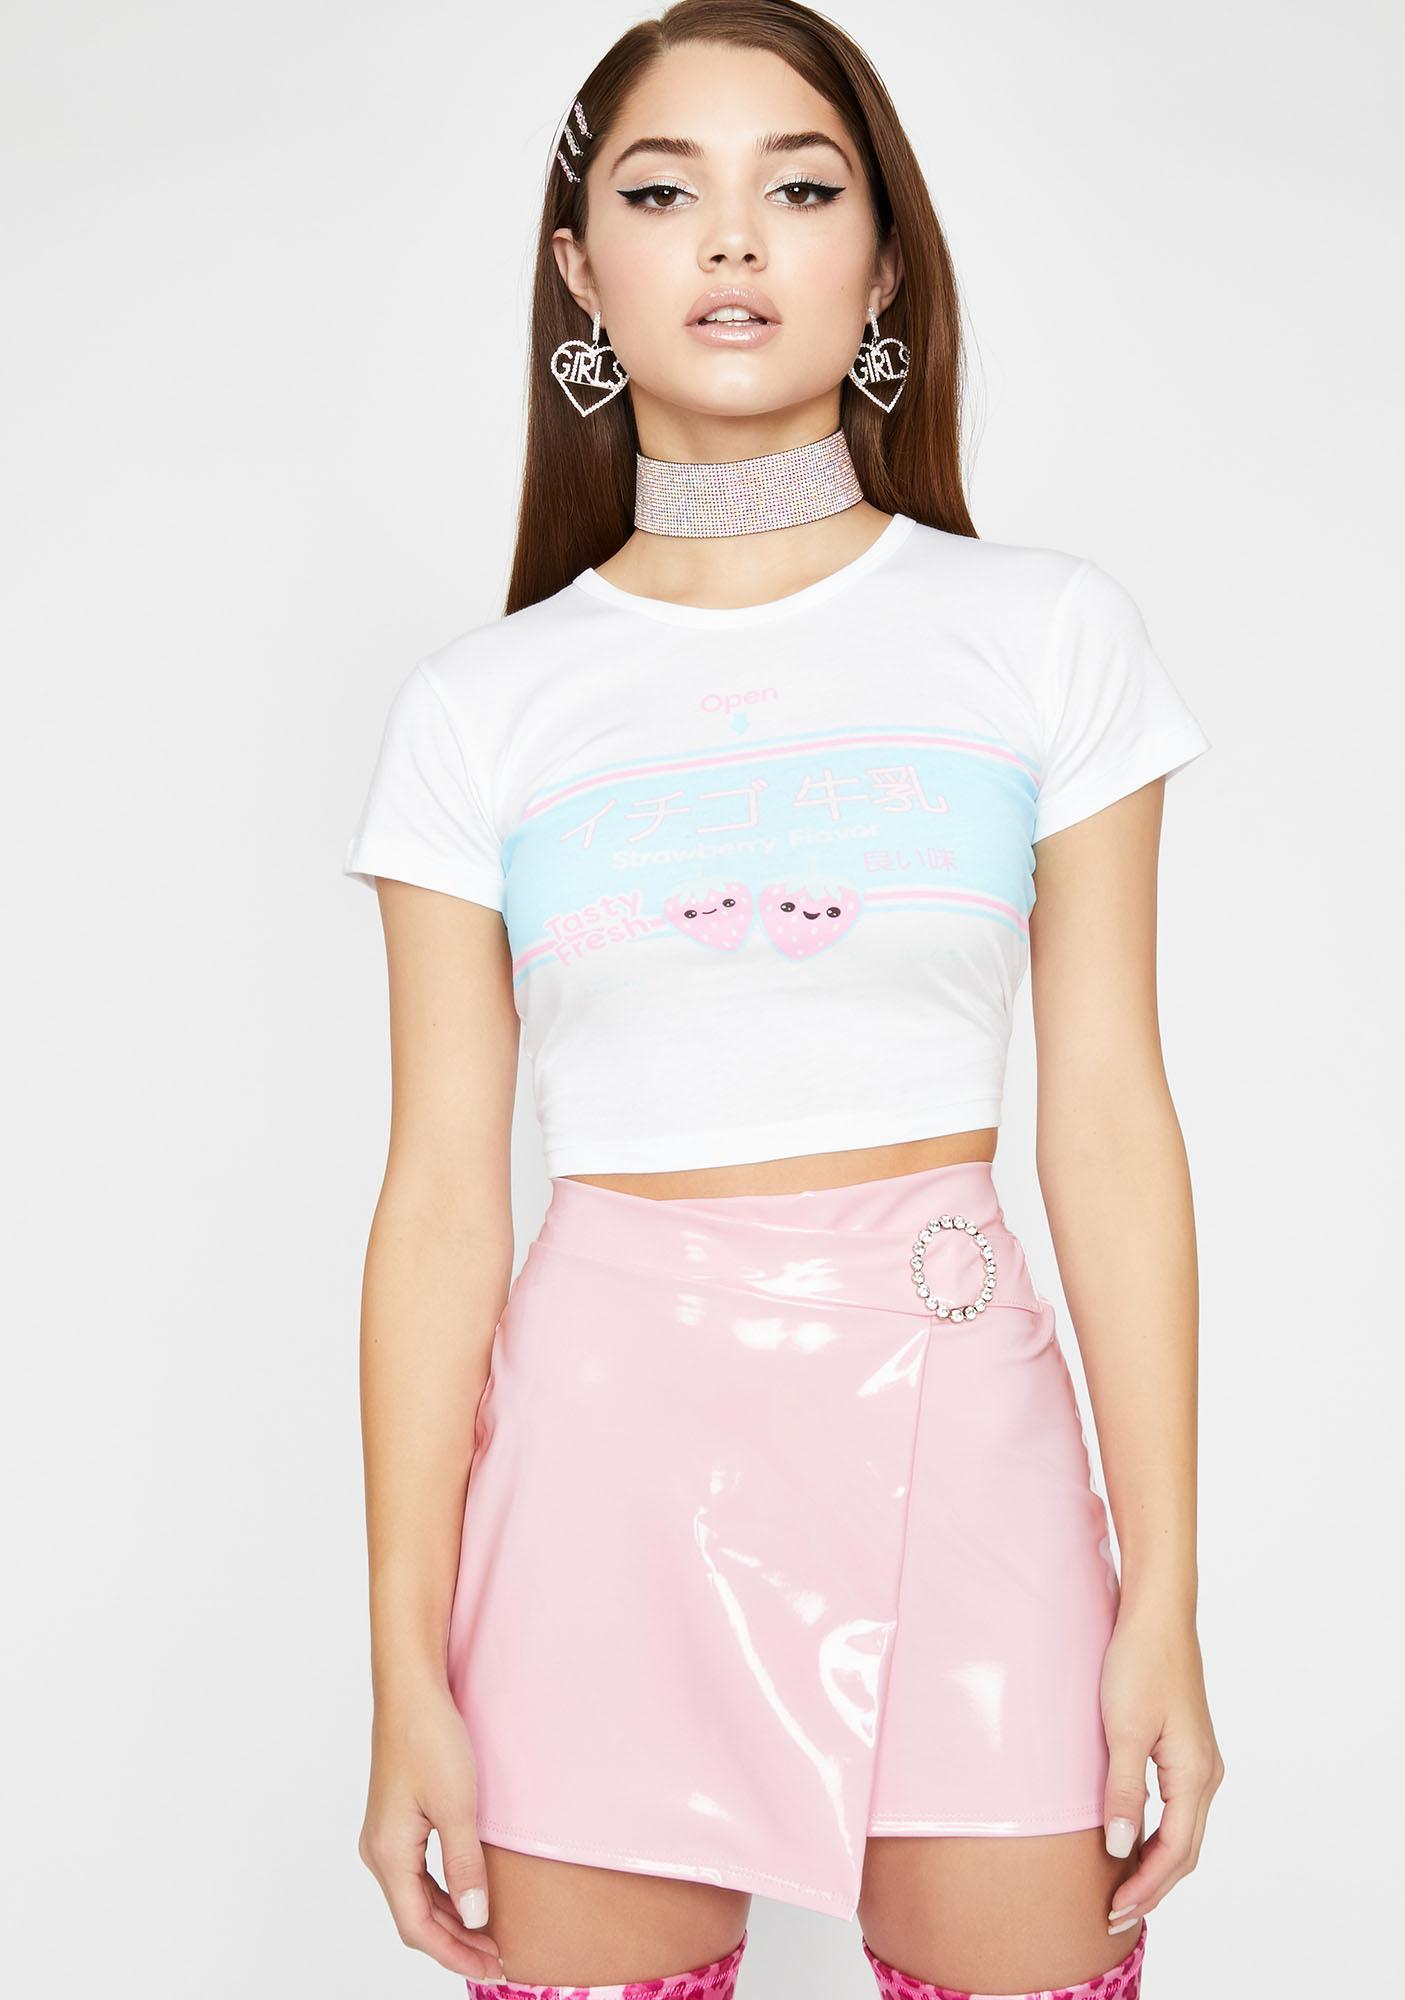 Bratty Bae Vinyl Skirt